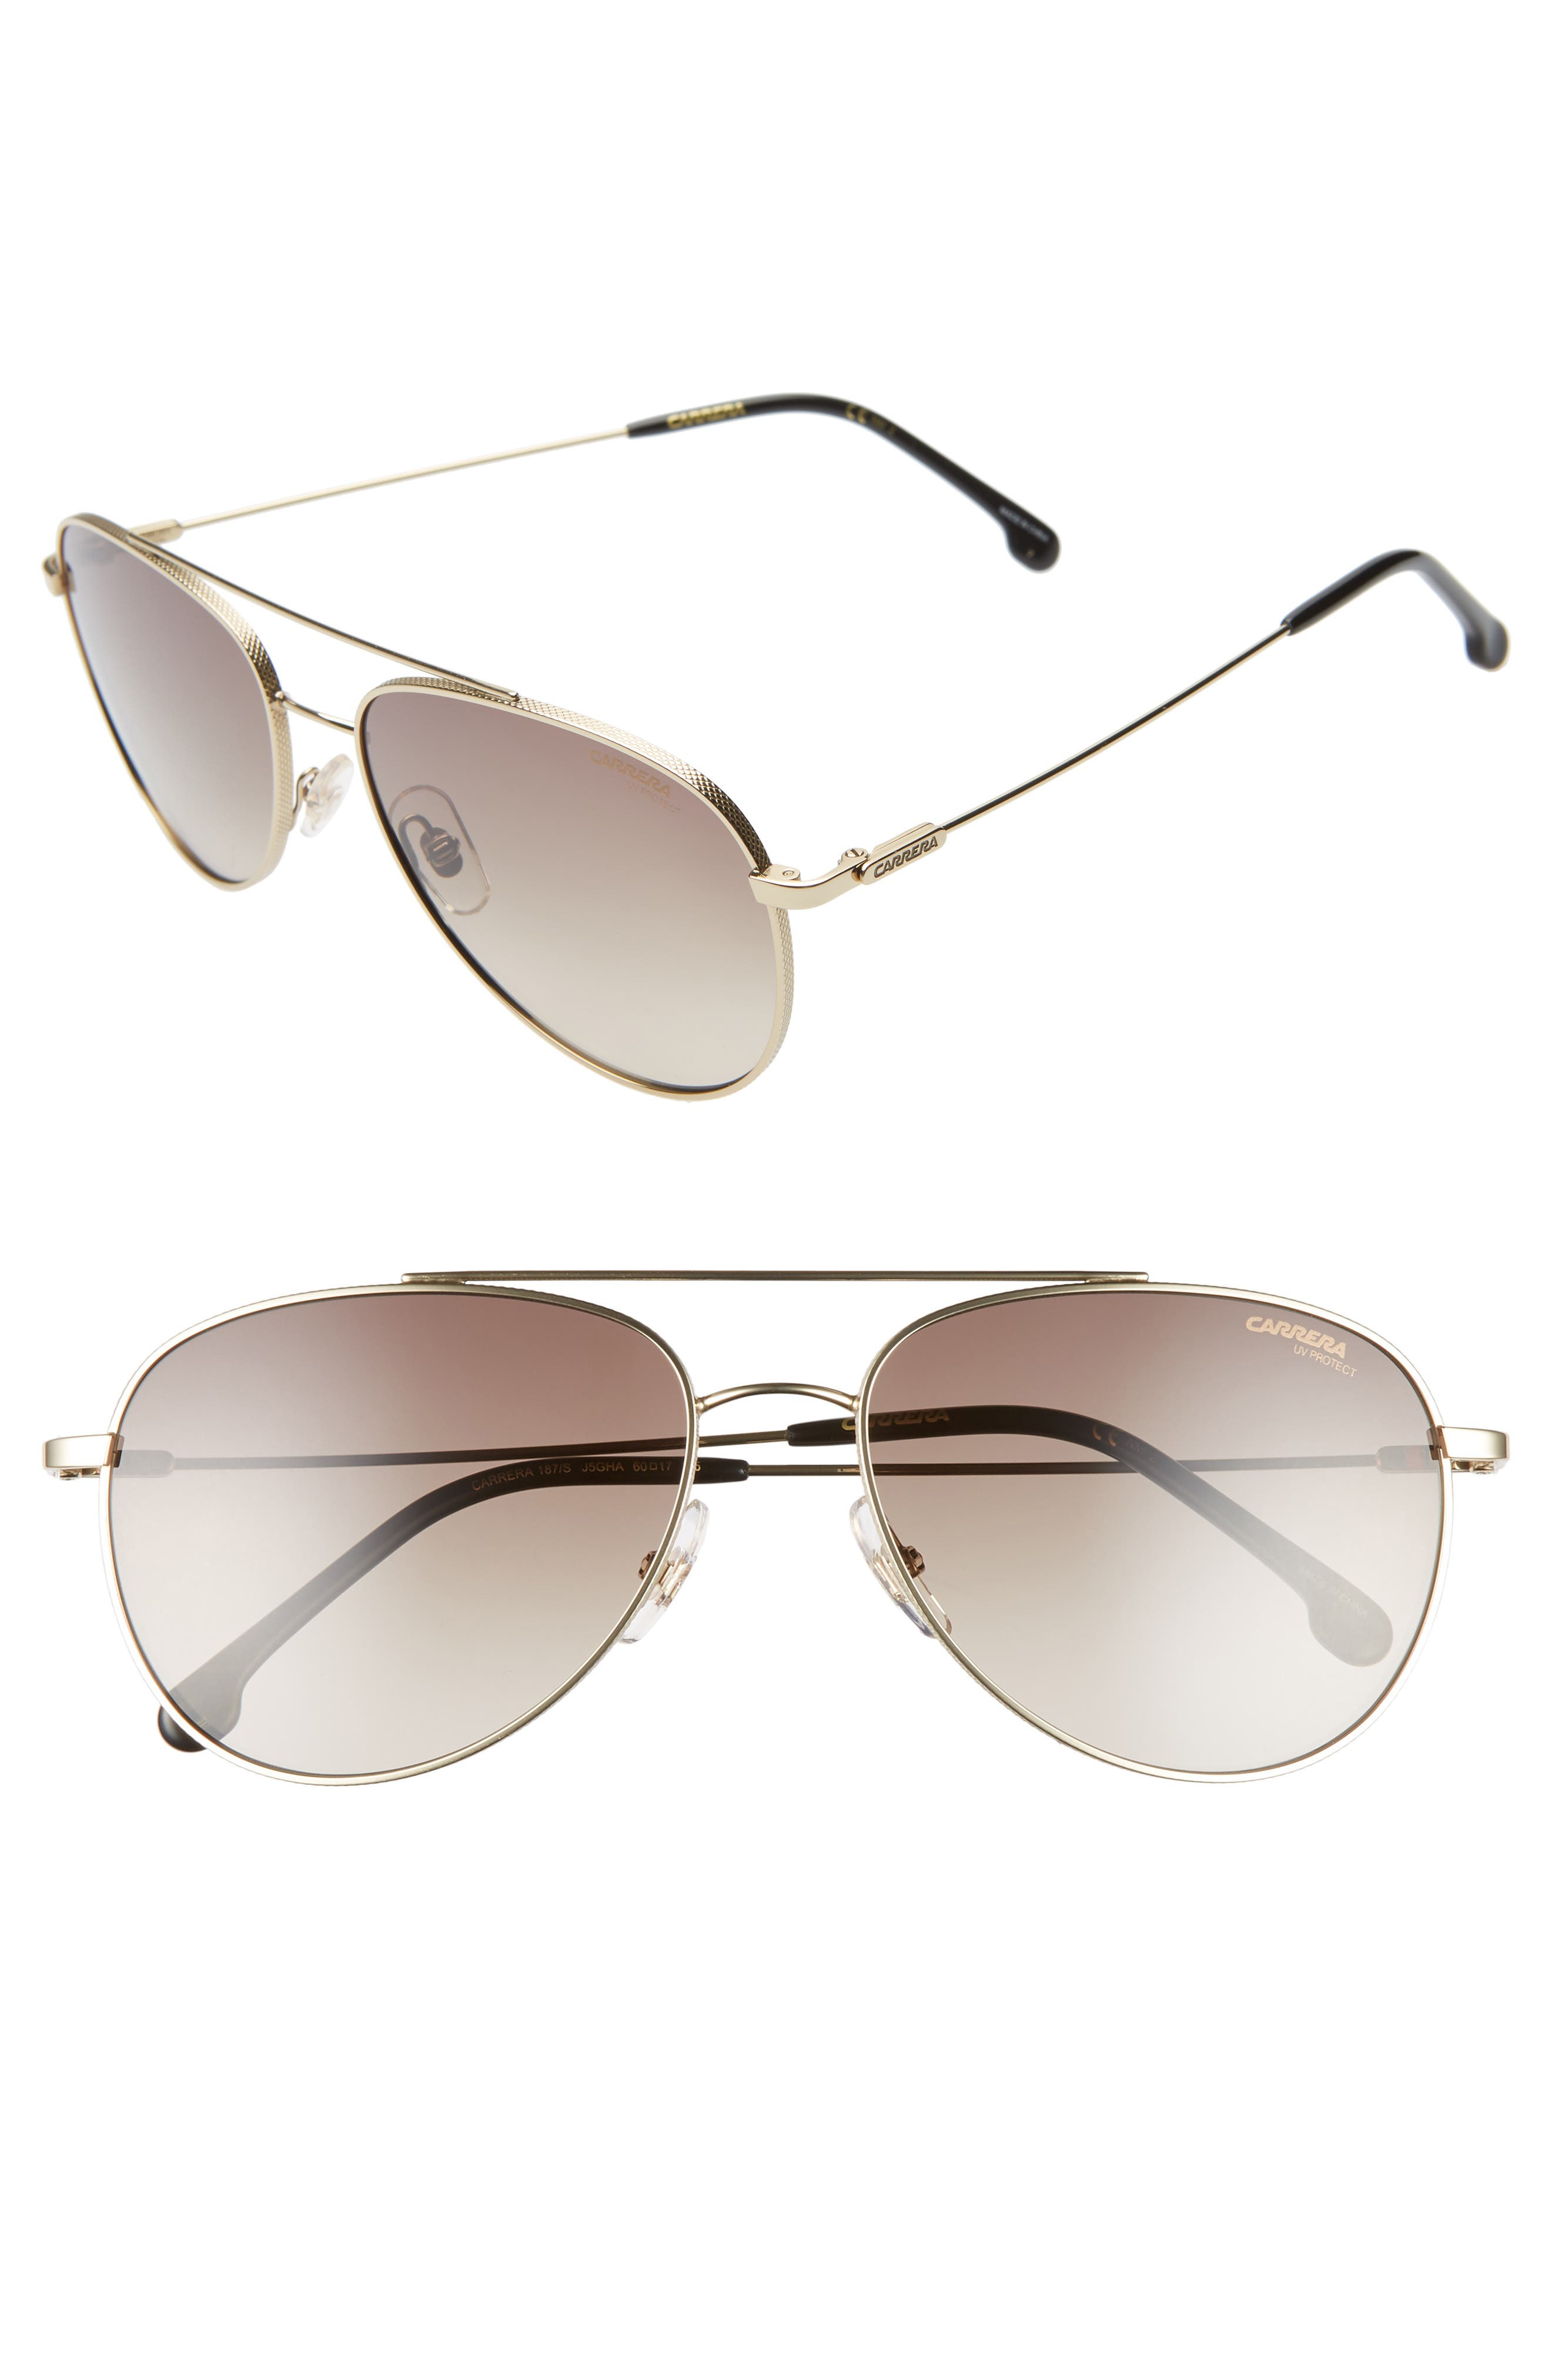 Carrera Eyewear 60Mm Aviator Sunglasses - Gold